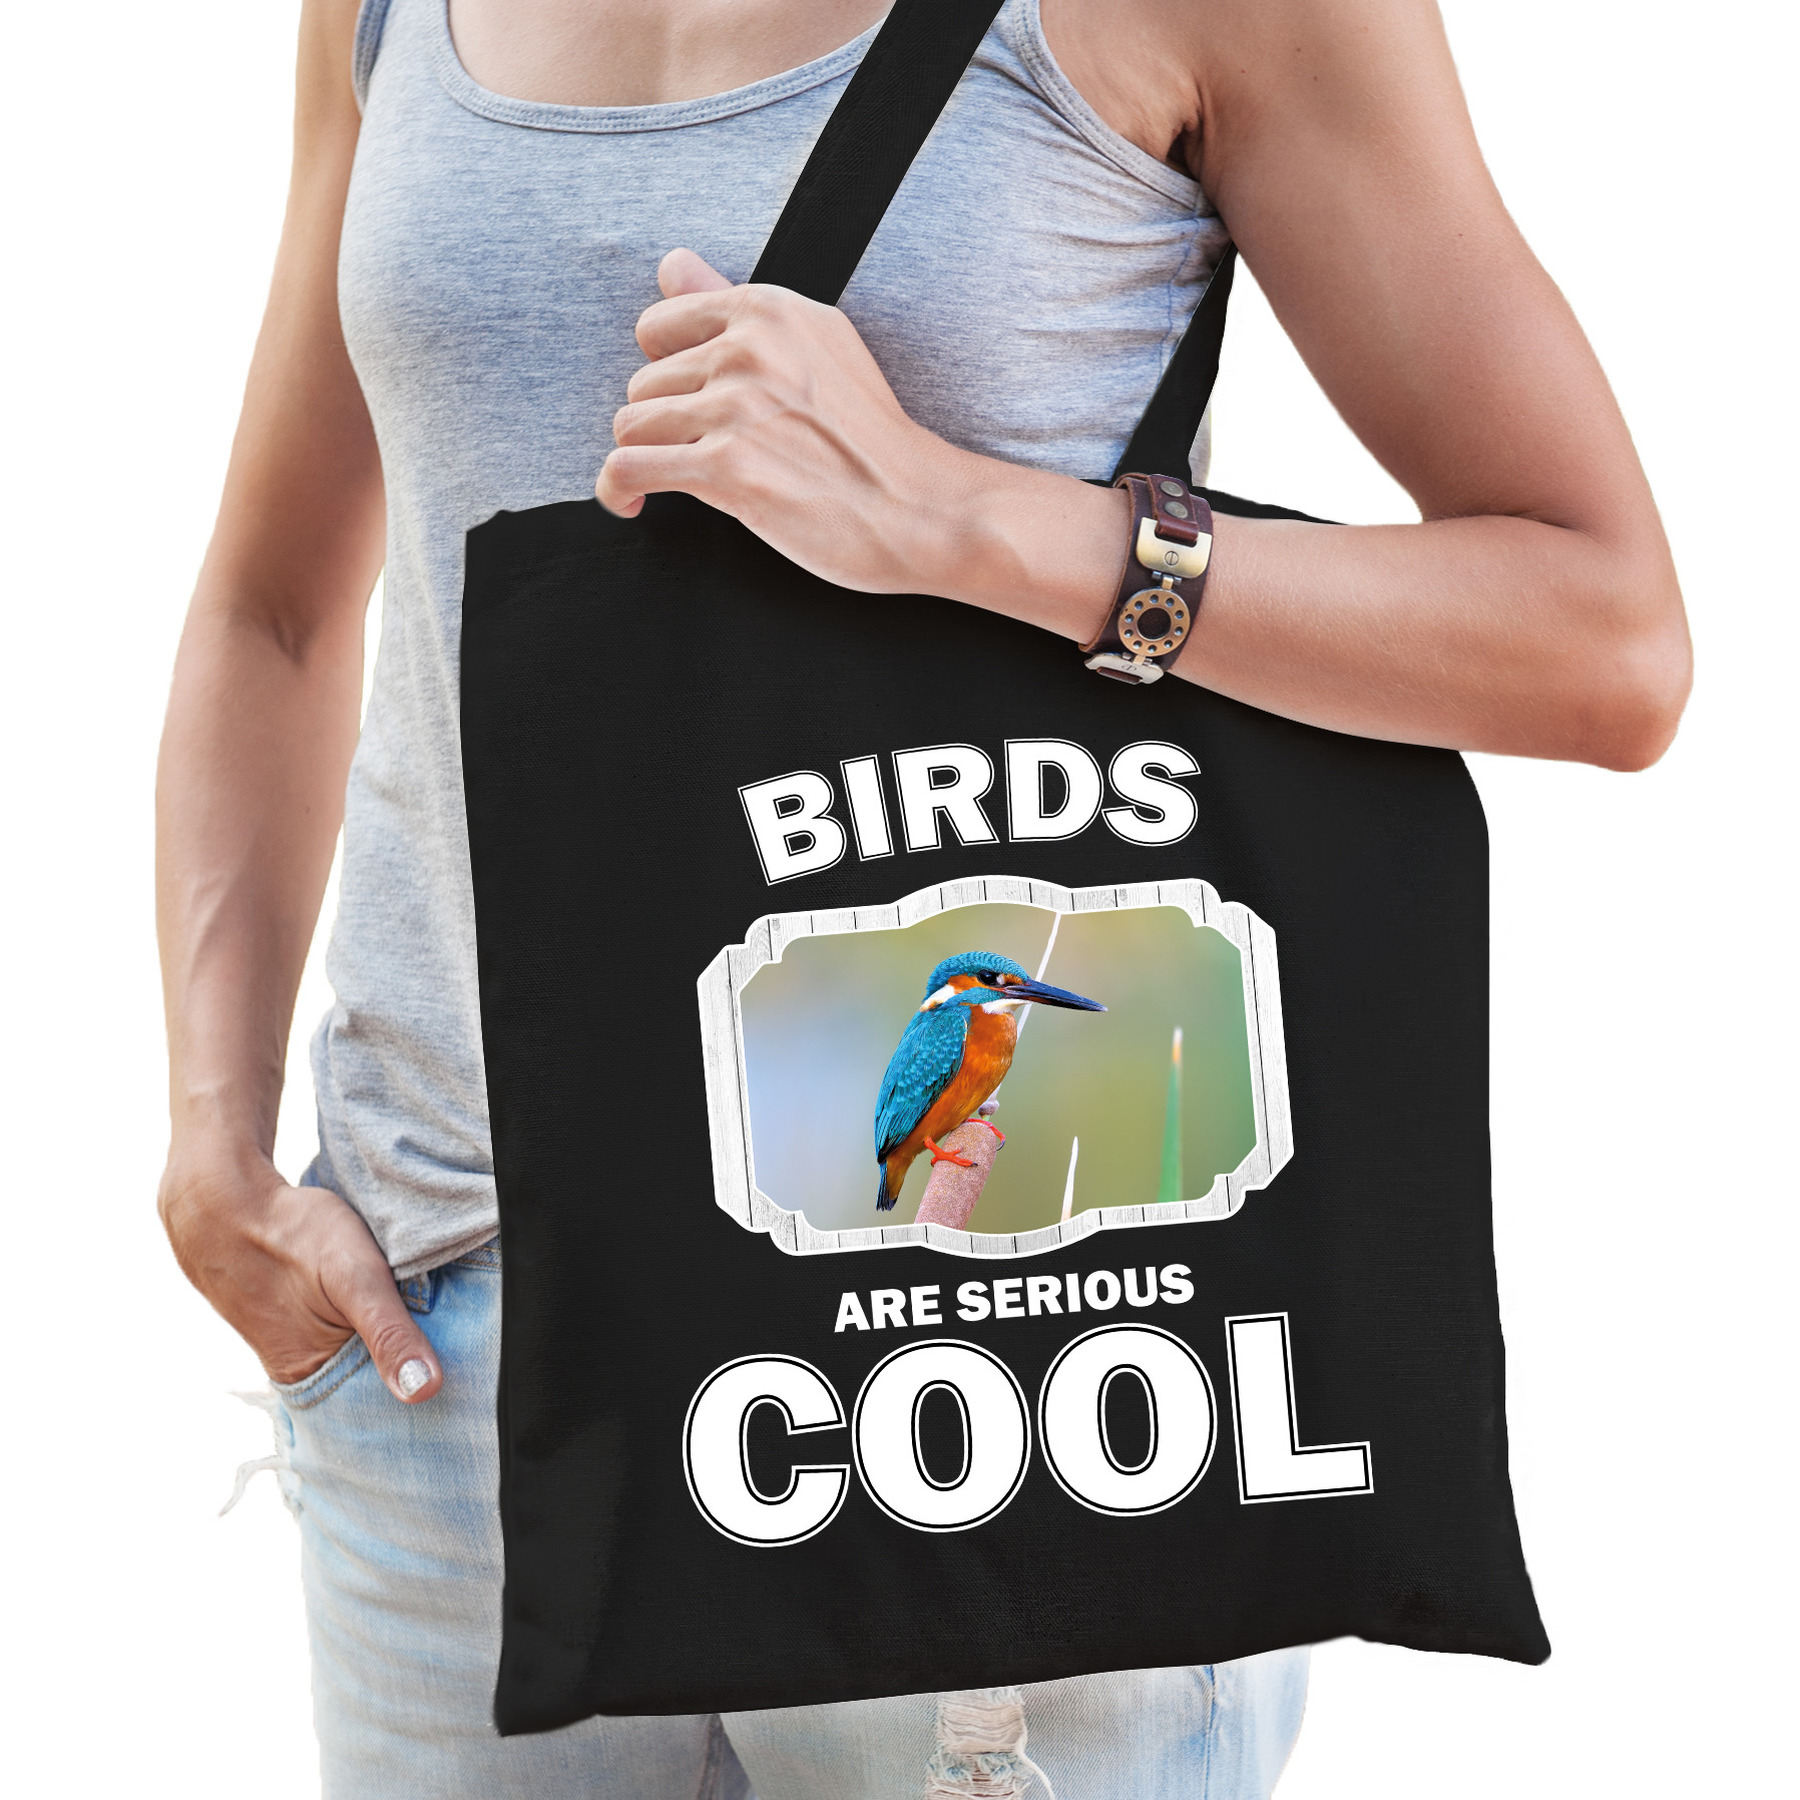 Katoenen tasje birds are serious cool zwart - vogels/ ijsvogel cadeau tas